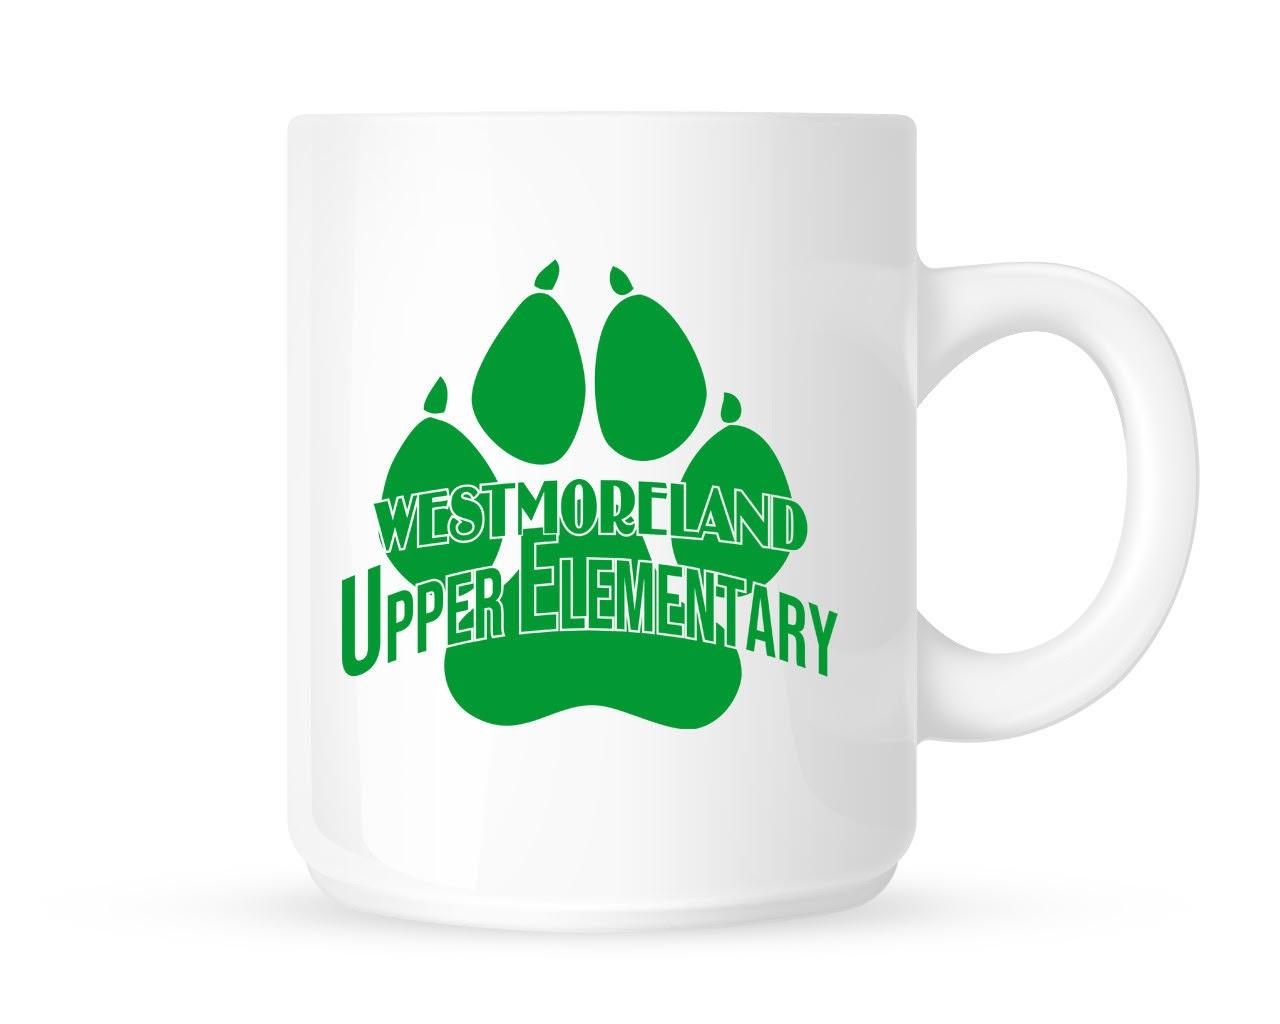 11oz White Ceramic Coffee Mug - Upper Elementary Logo